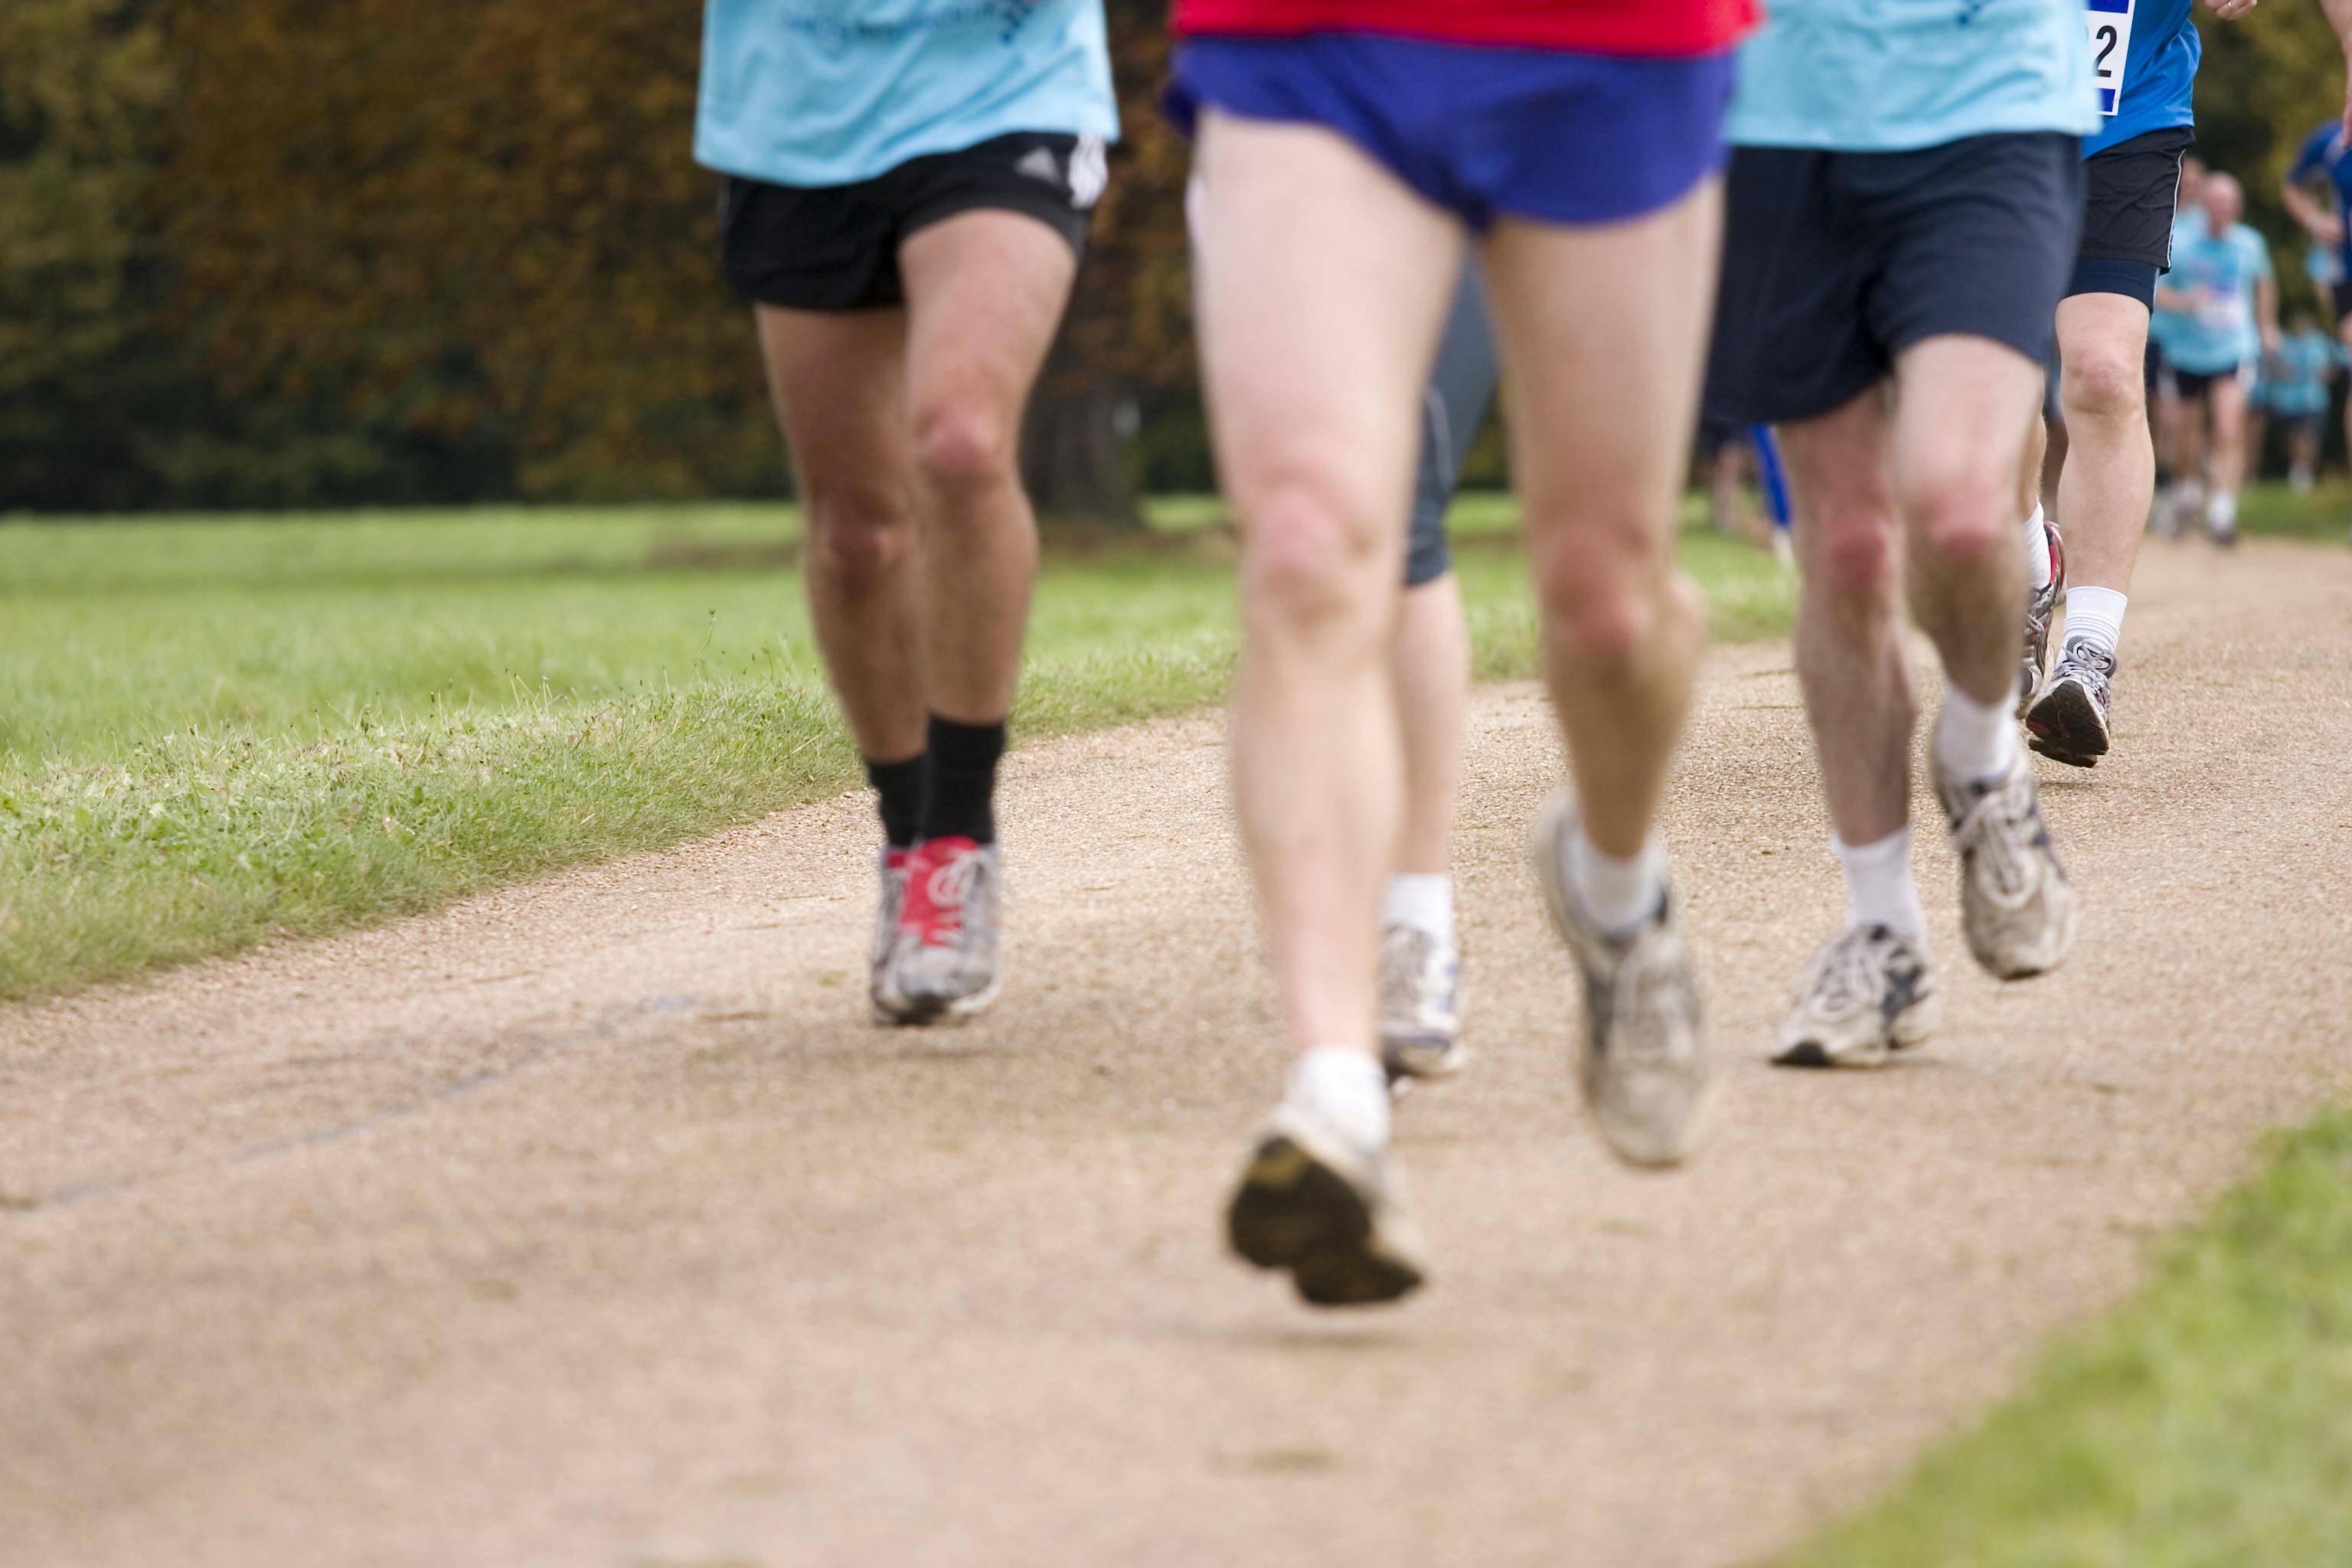 TrustATrader Partner with Friends of the Elderly for Battersea Park 5k and 10k Runs on Sunday 18 October